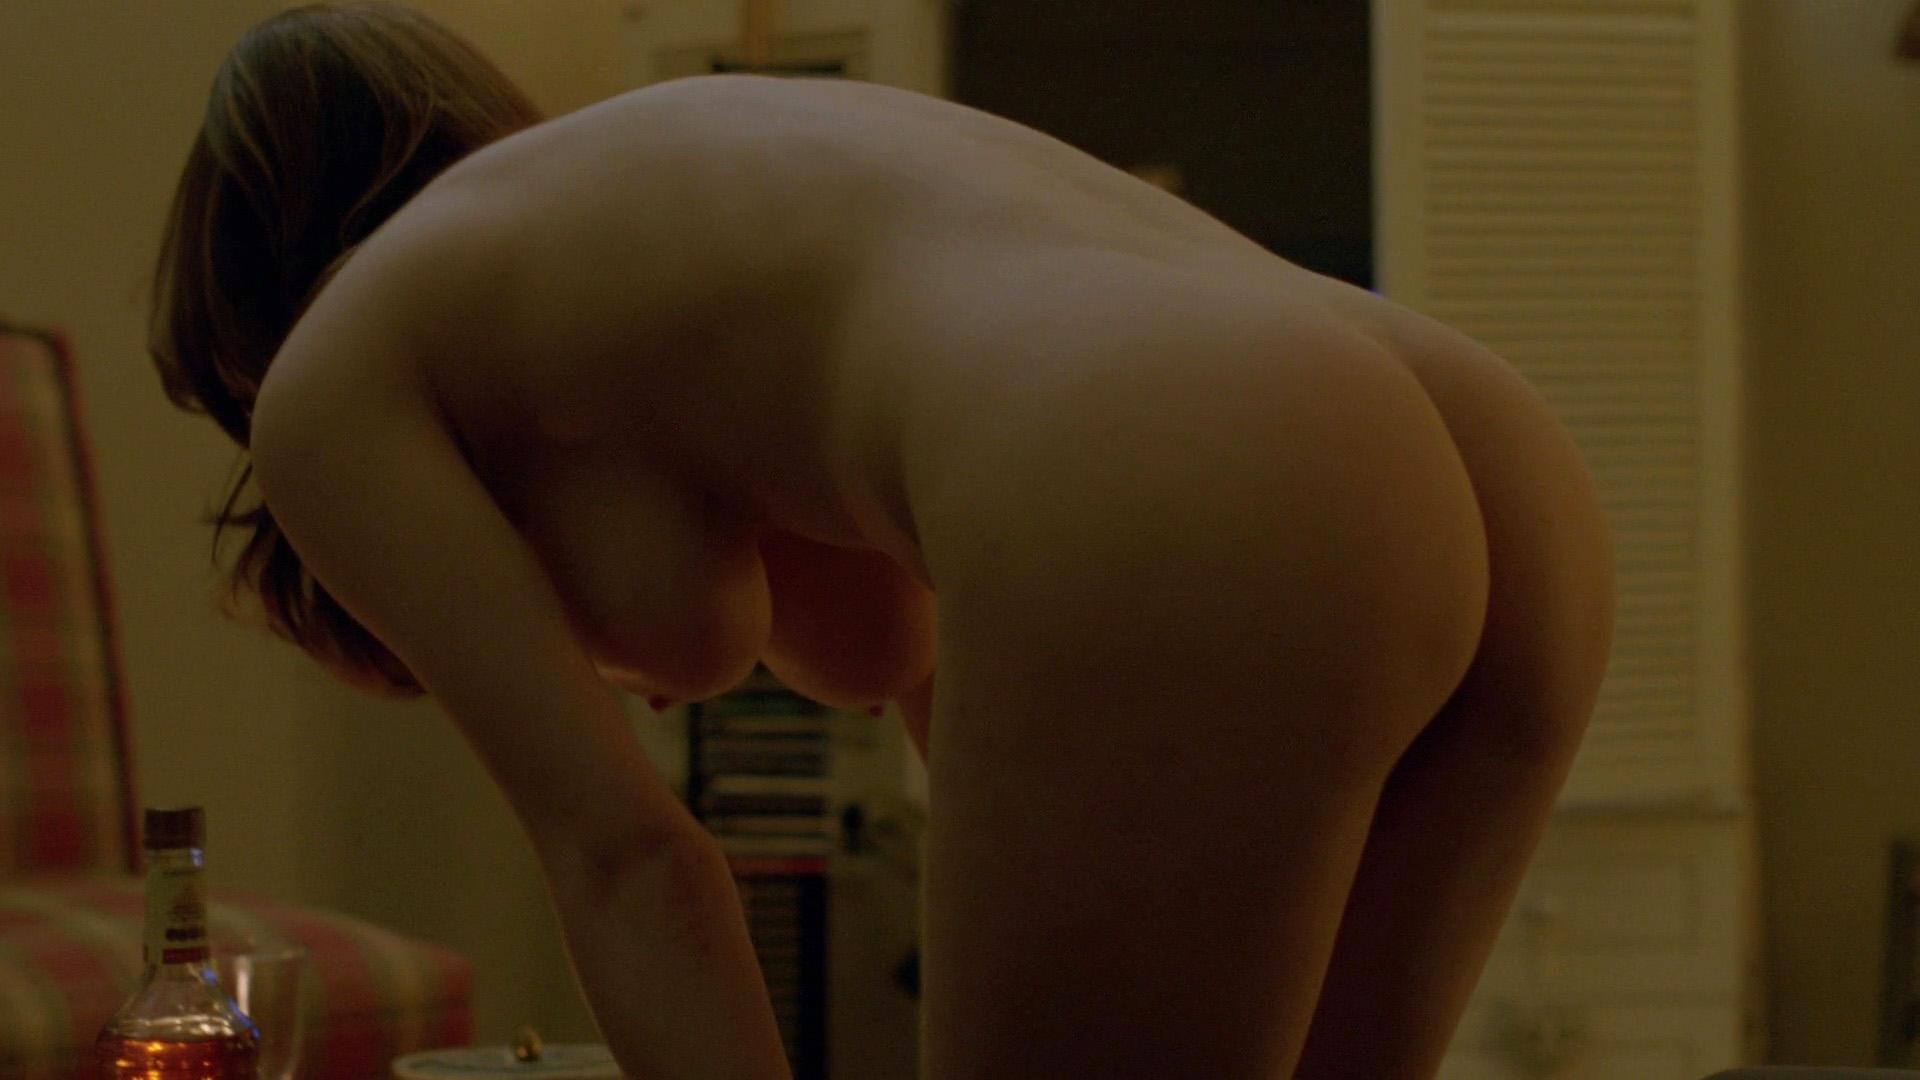 true Alexandra detective naked daddario